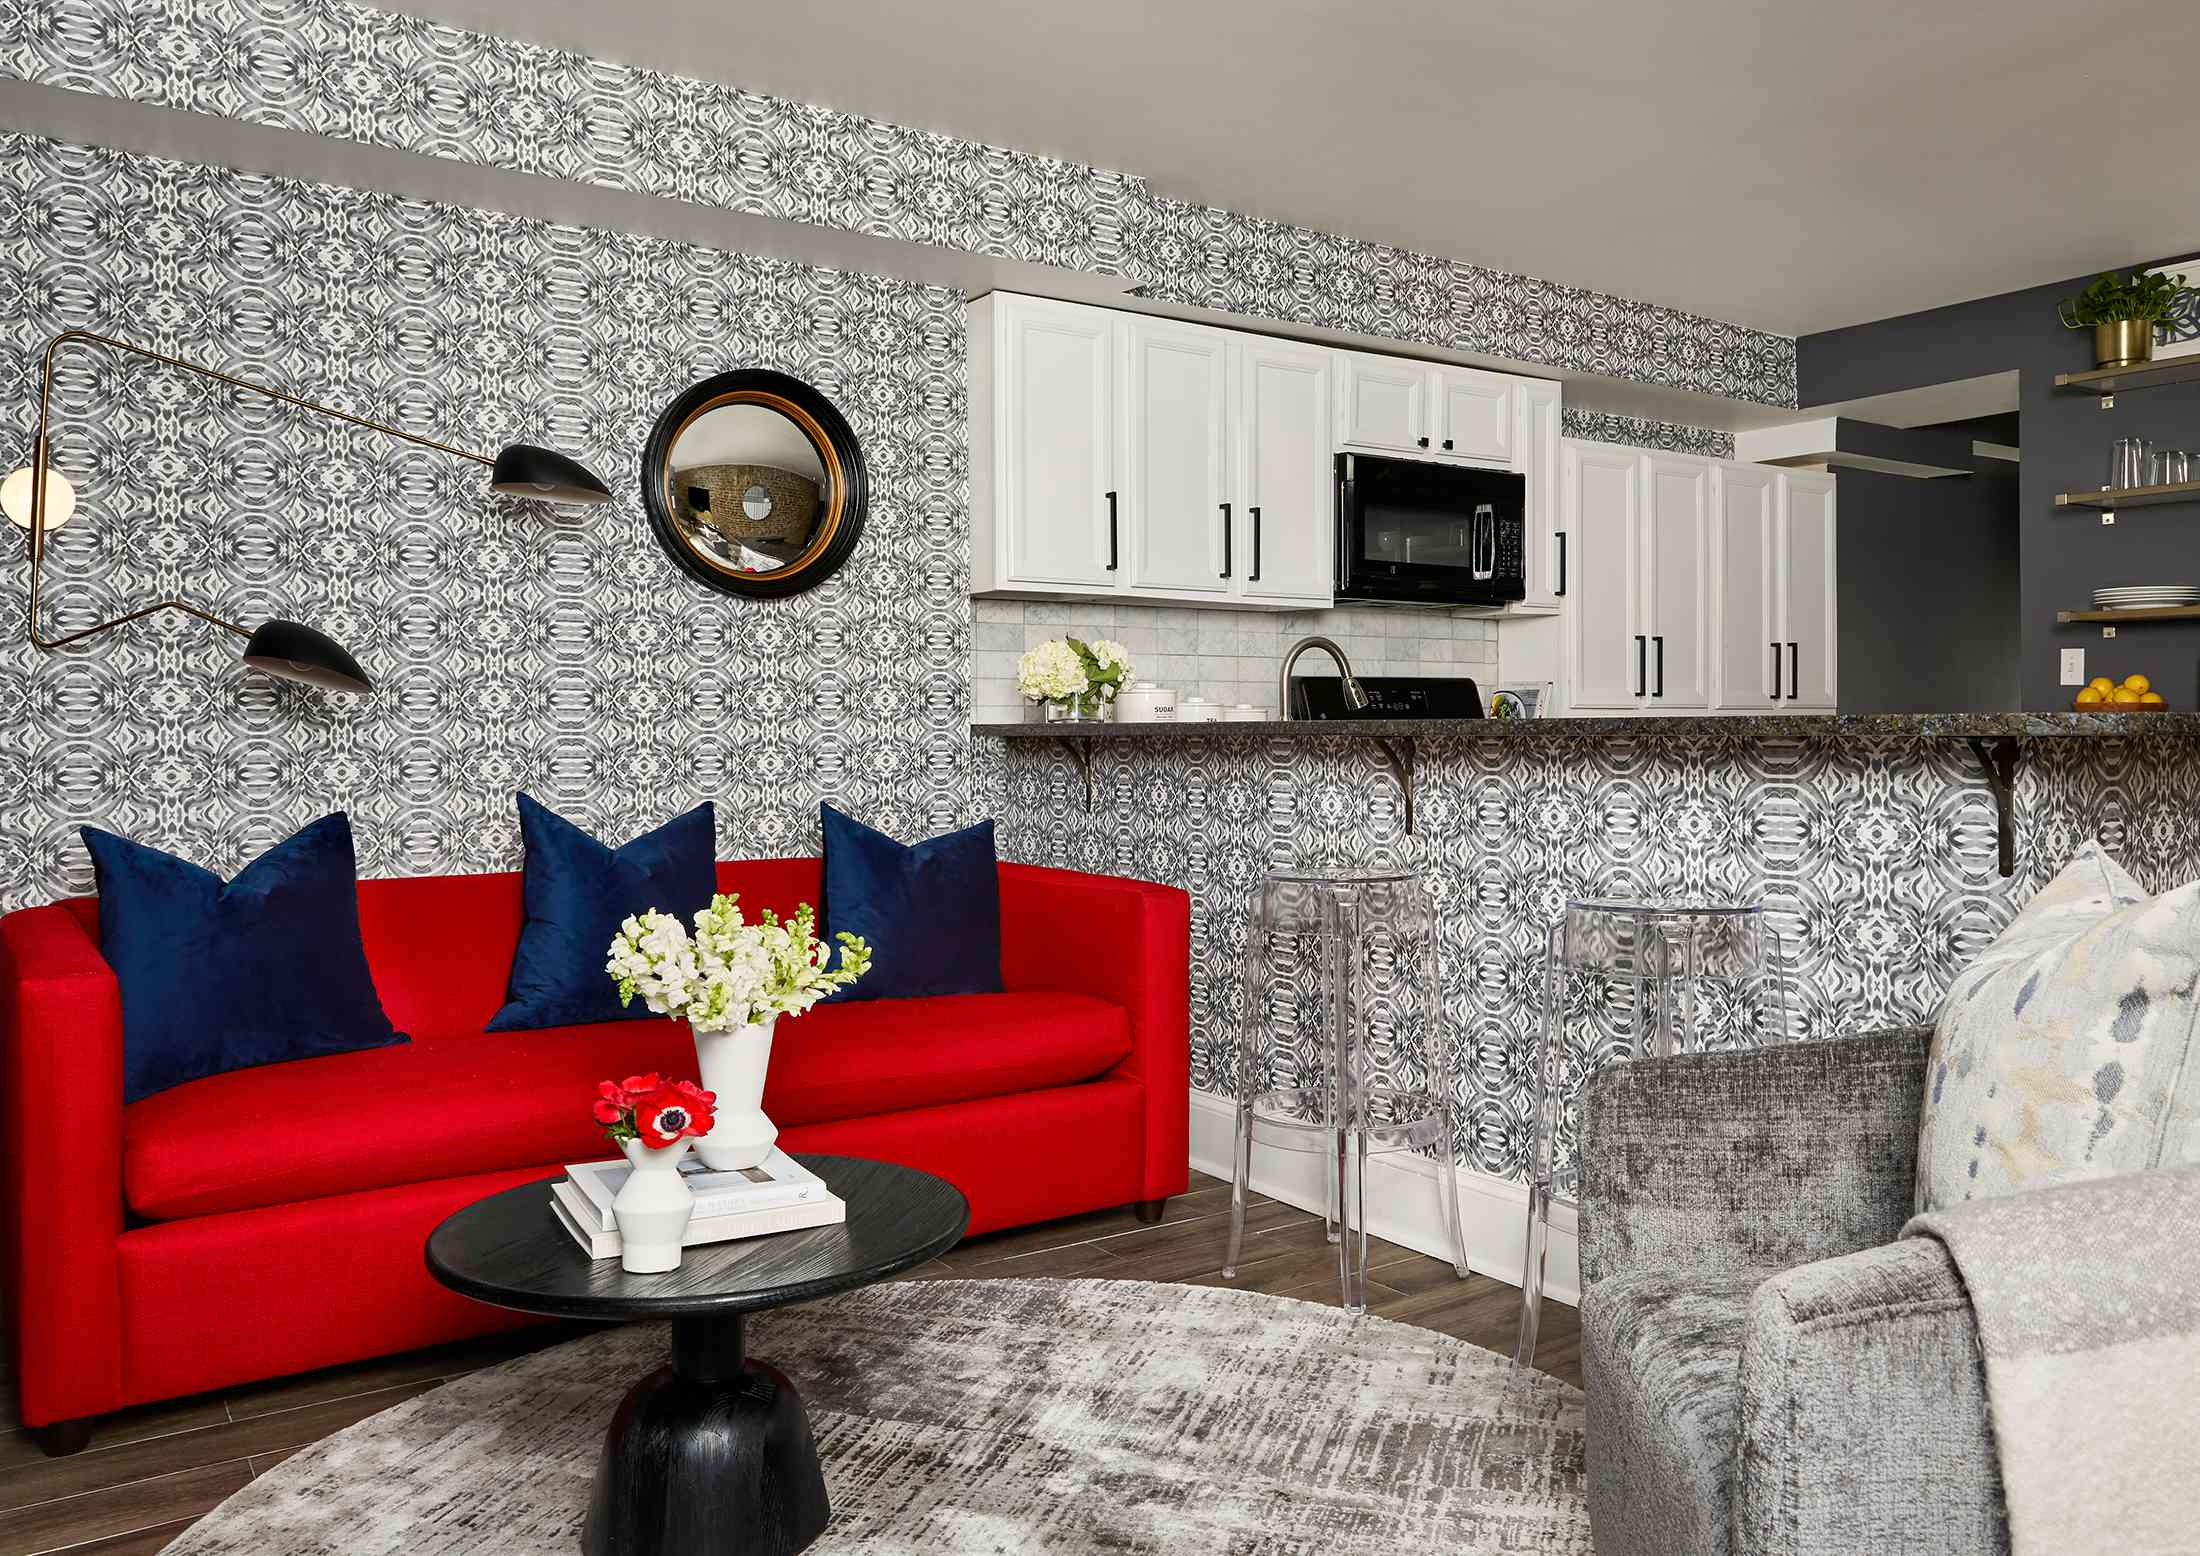 Duke Ellington home tour - living room and kitchen area